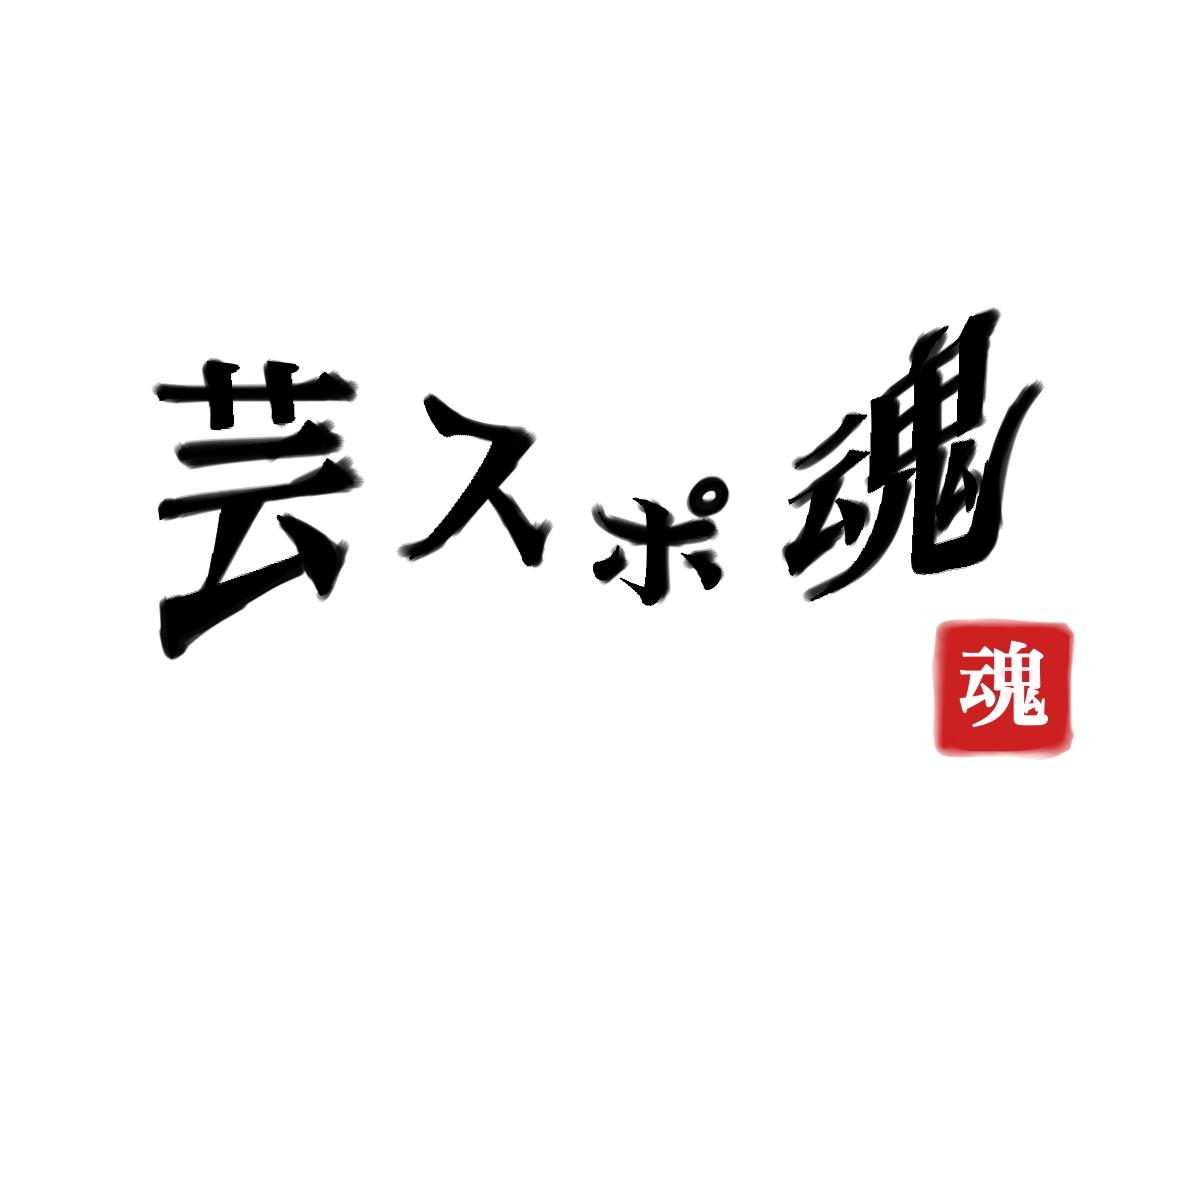 友井雄亮|焼肉店店長の現在。北新地神威の場所は?本名は牧山雄亮